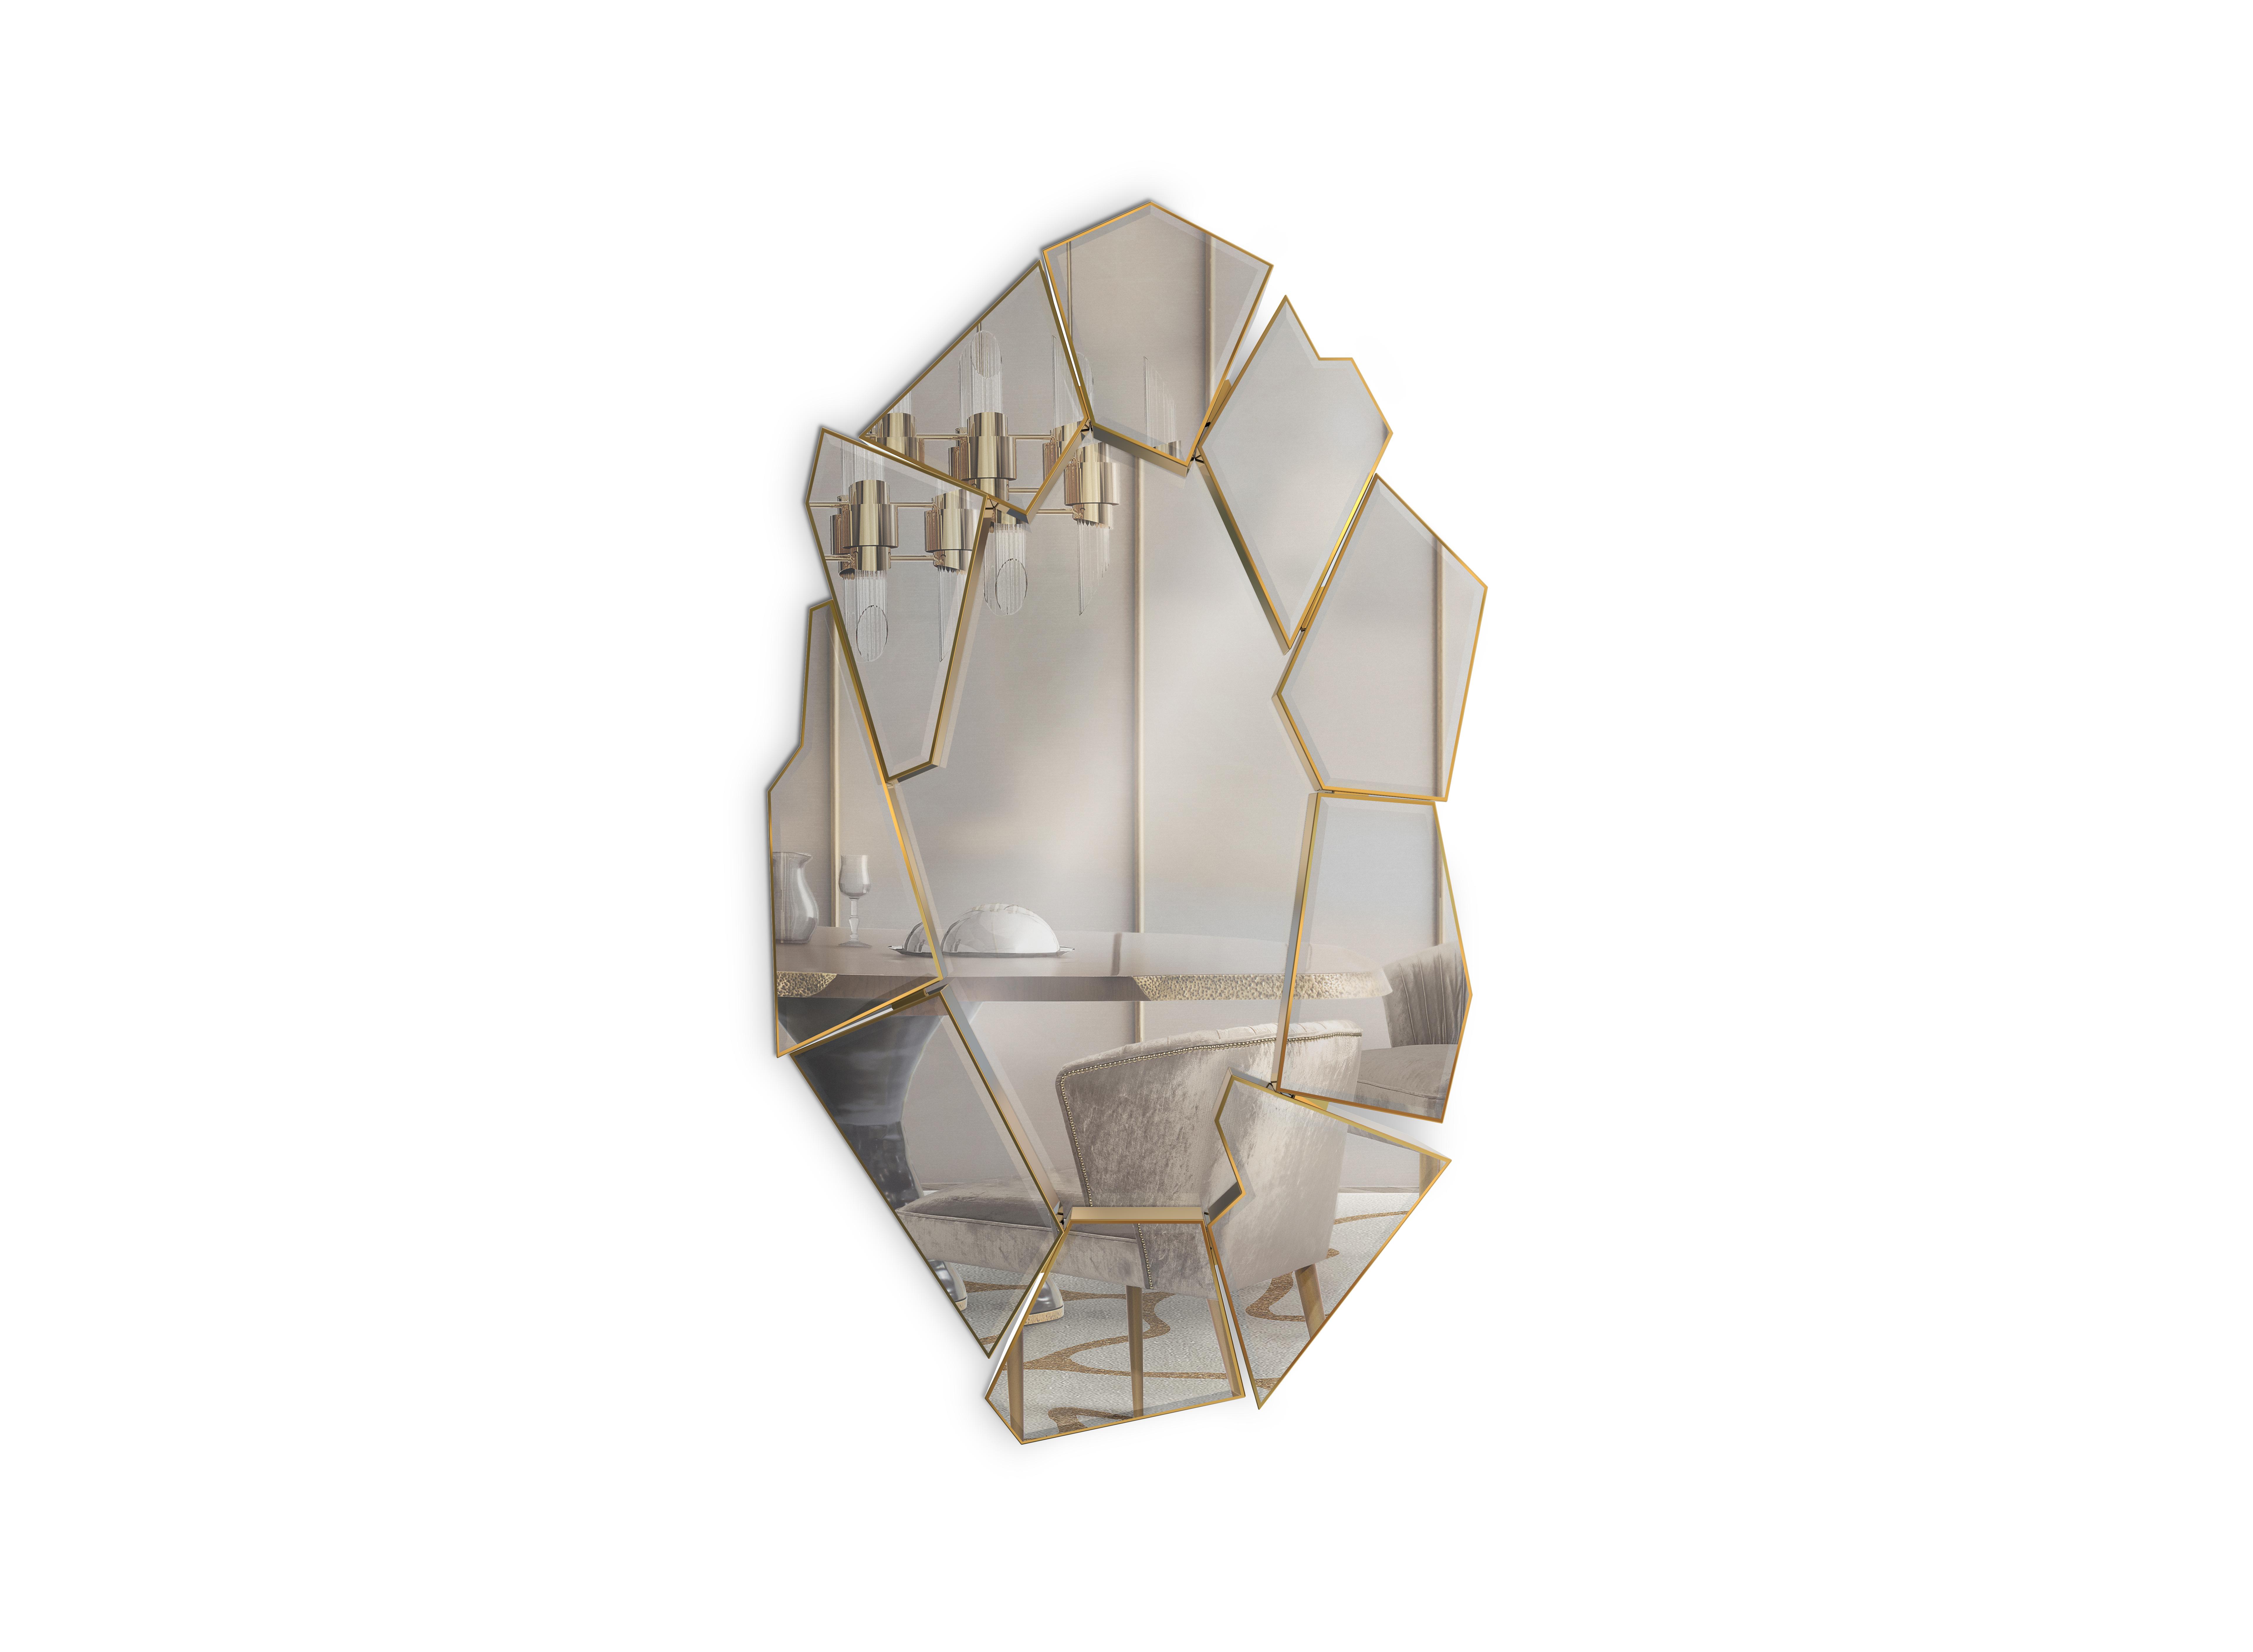 http://www.luxxu.net/furniture/crackle-mirror.php/?utm_source=LuxxuBlog&utm_medium=LuxxuBlog&utm_content=Article&utm_campaign=LuxxuBlog